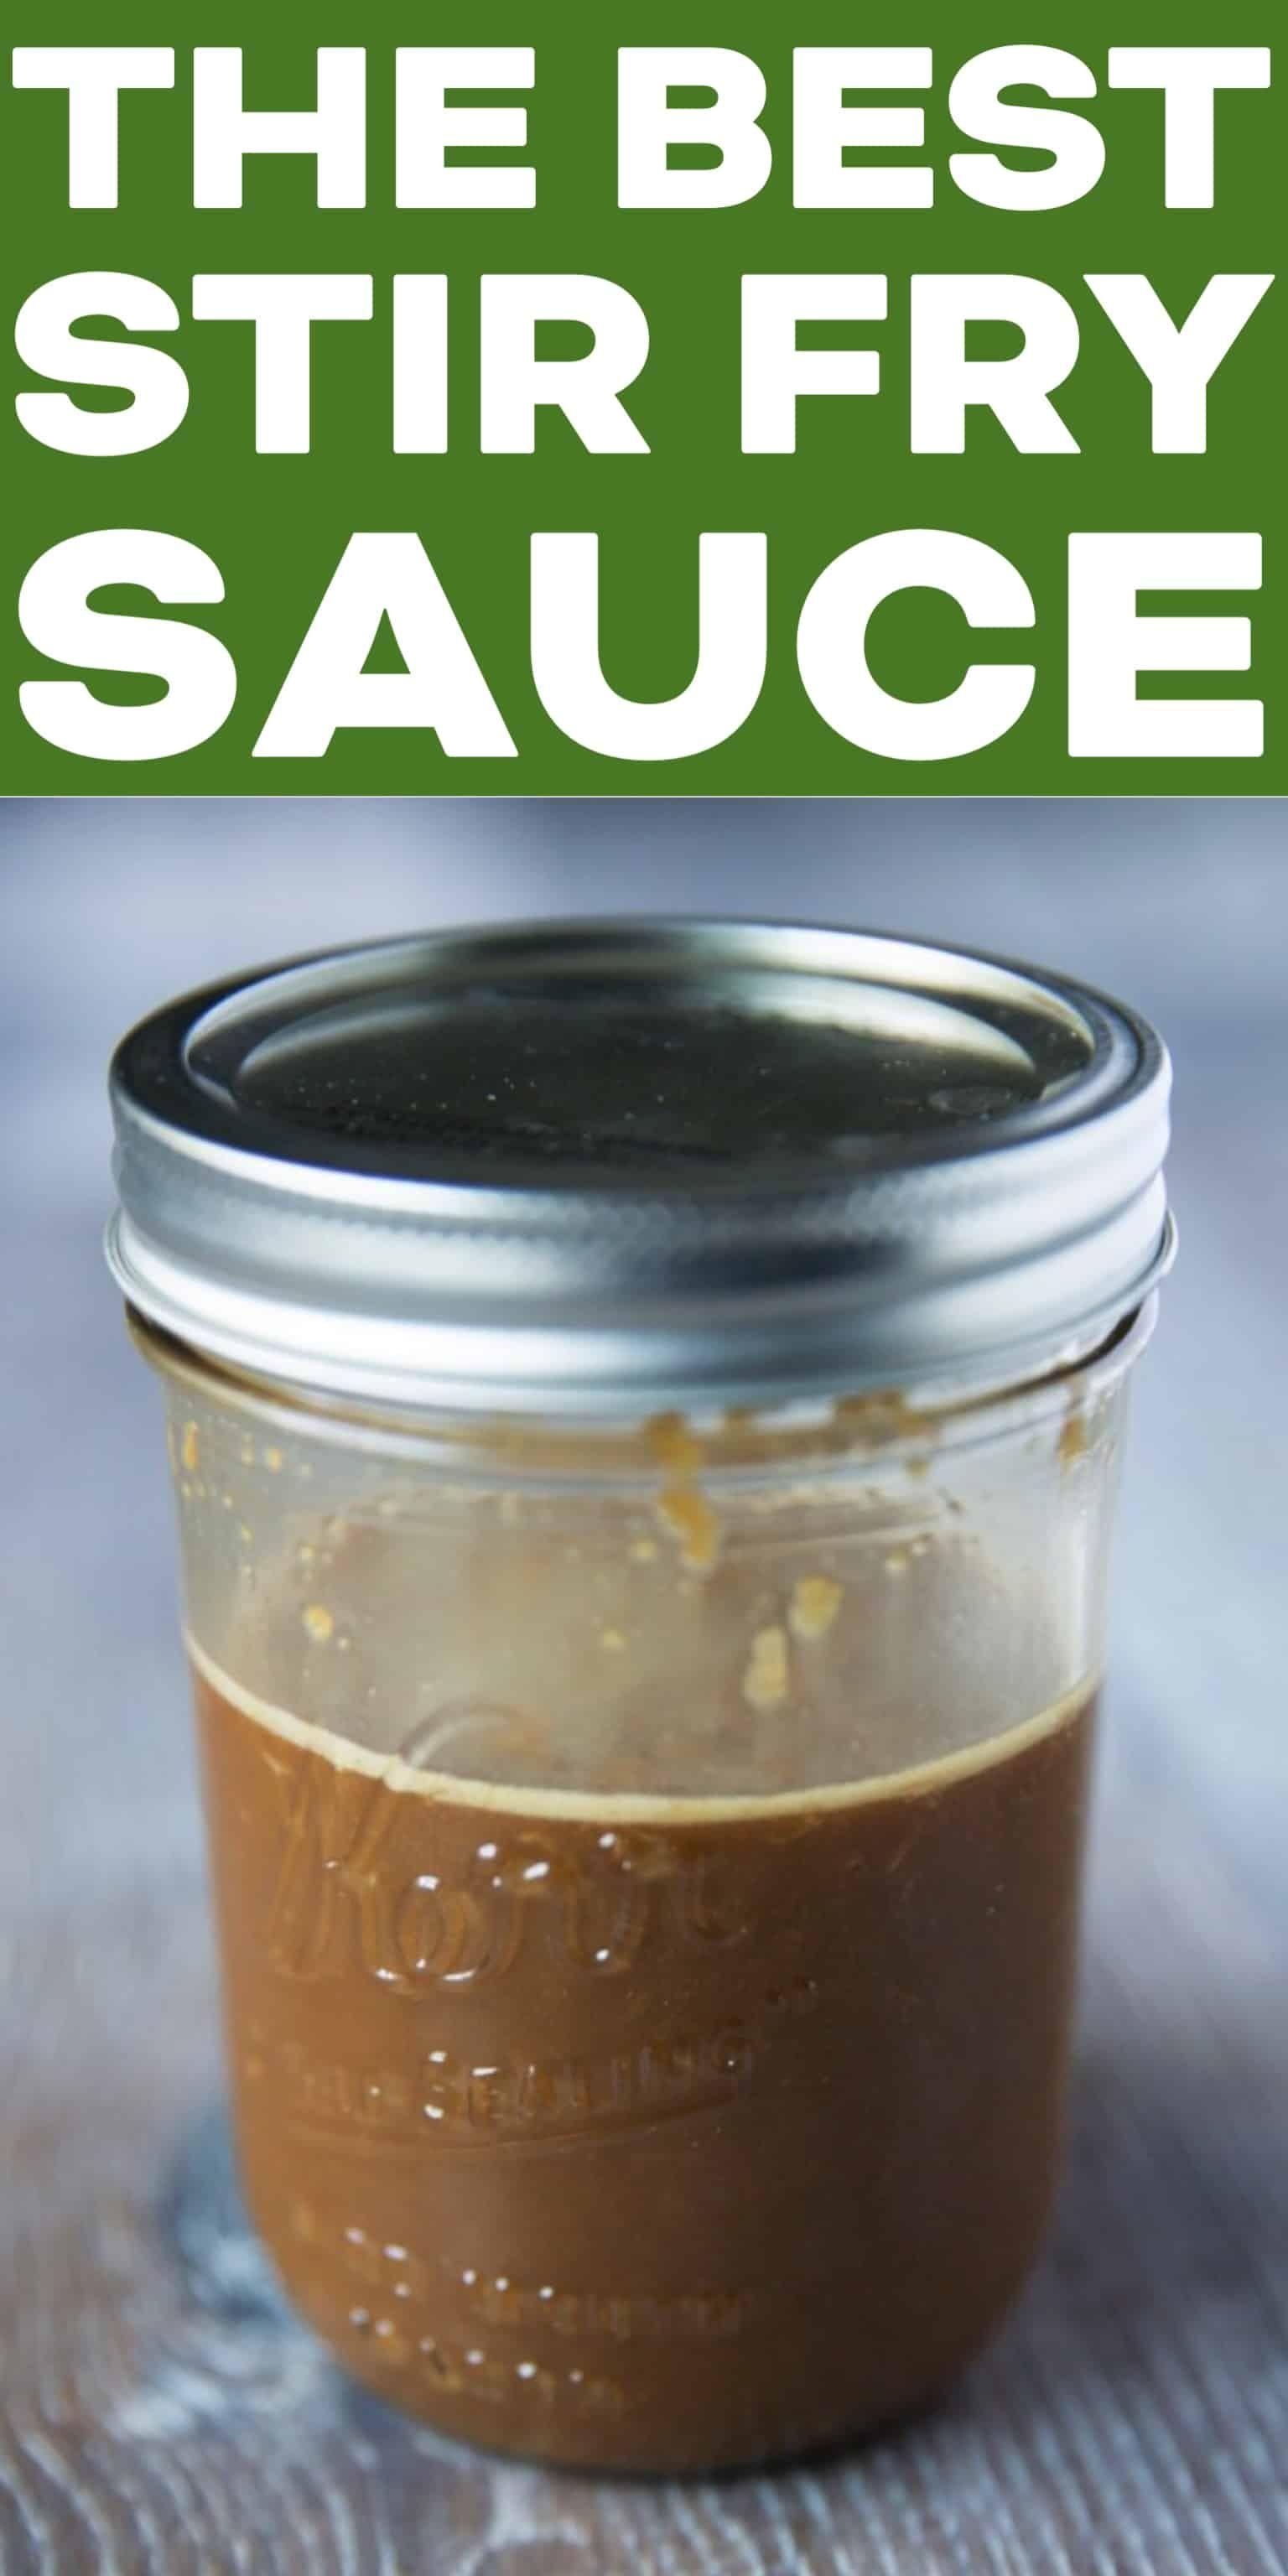 The BEST Stir Fry Sauce!